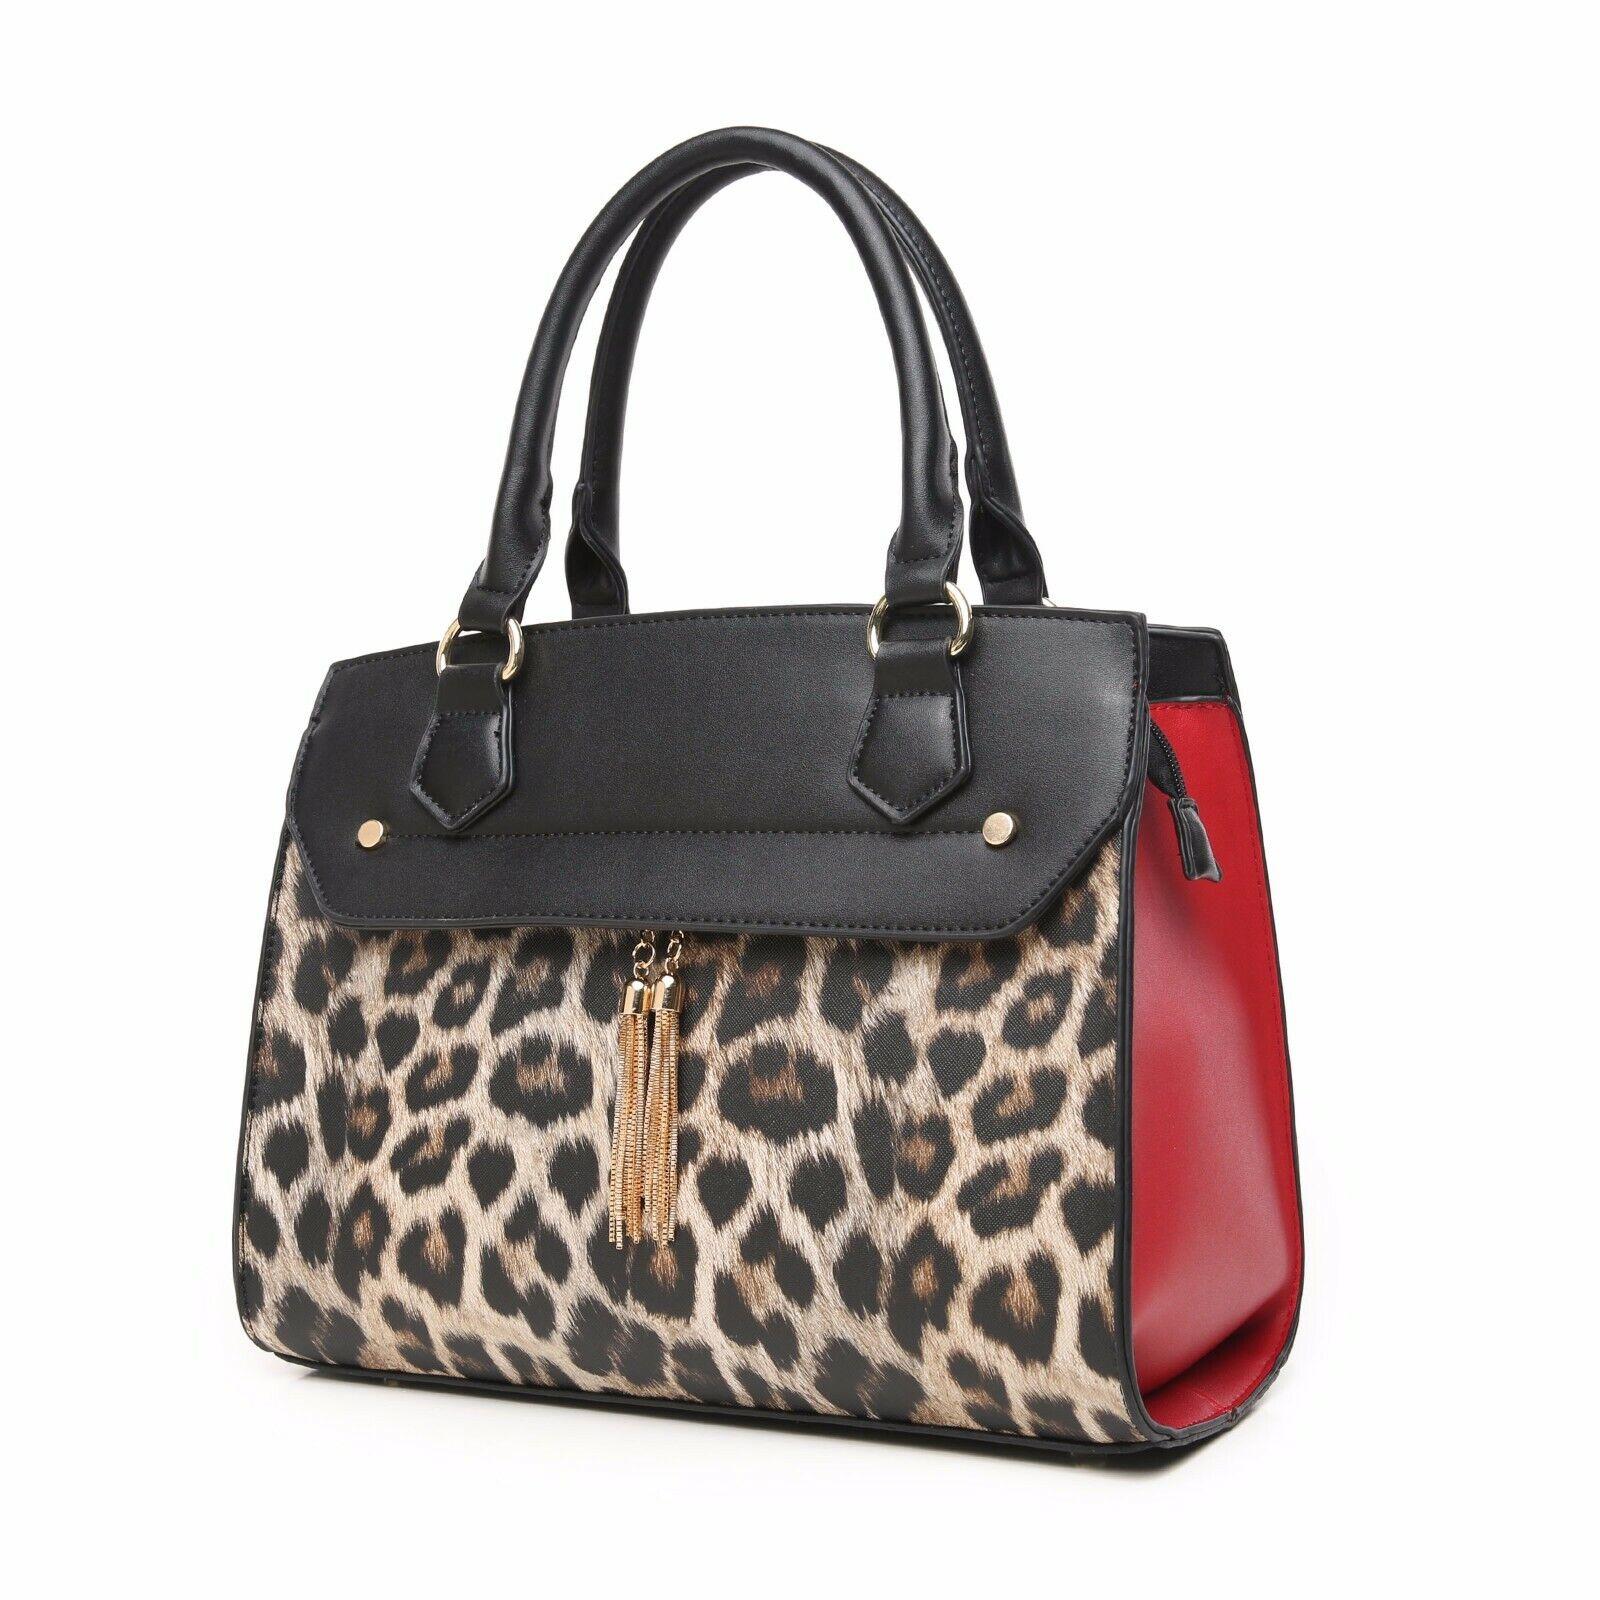 Aitbags Leather Handbag for Women Leopard Print Work Tote Pu